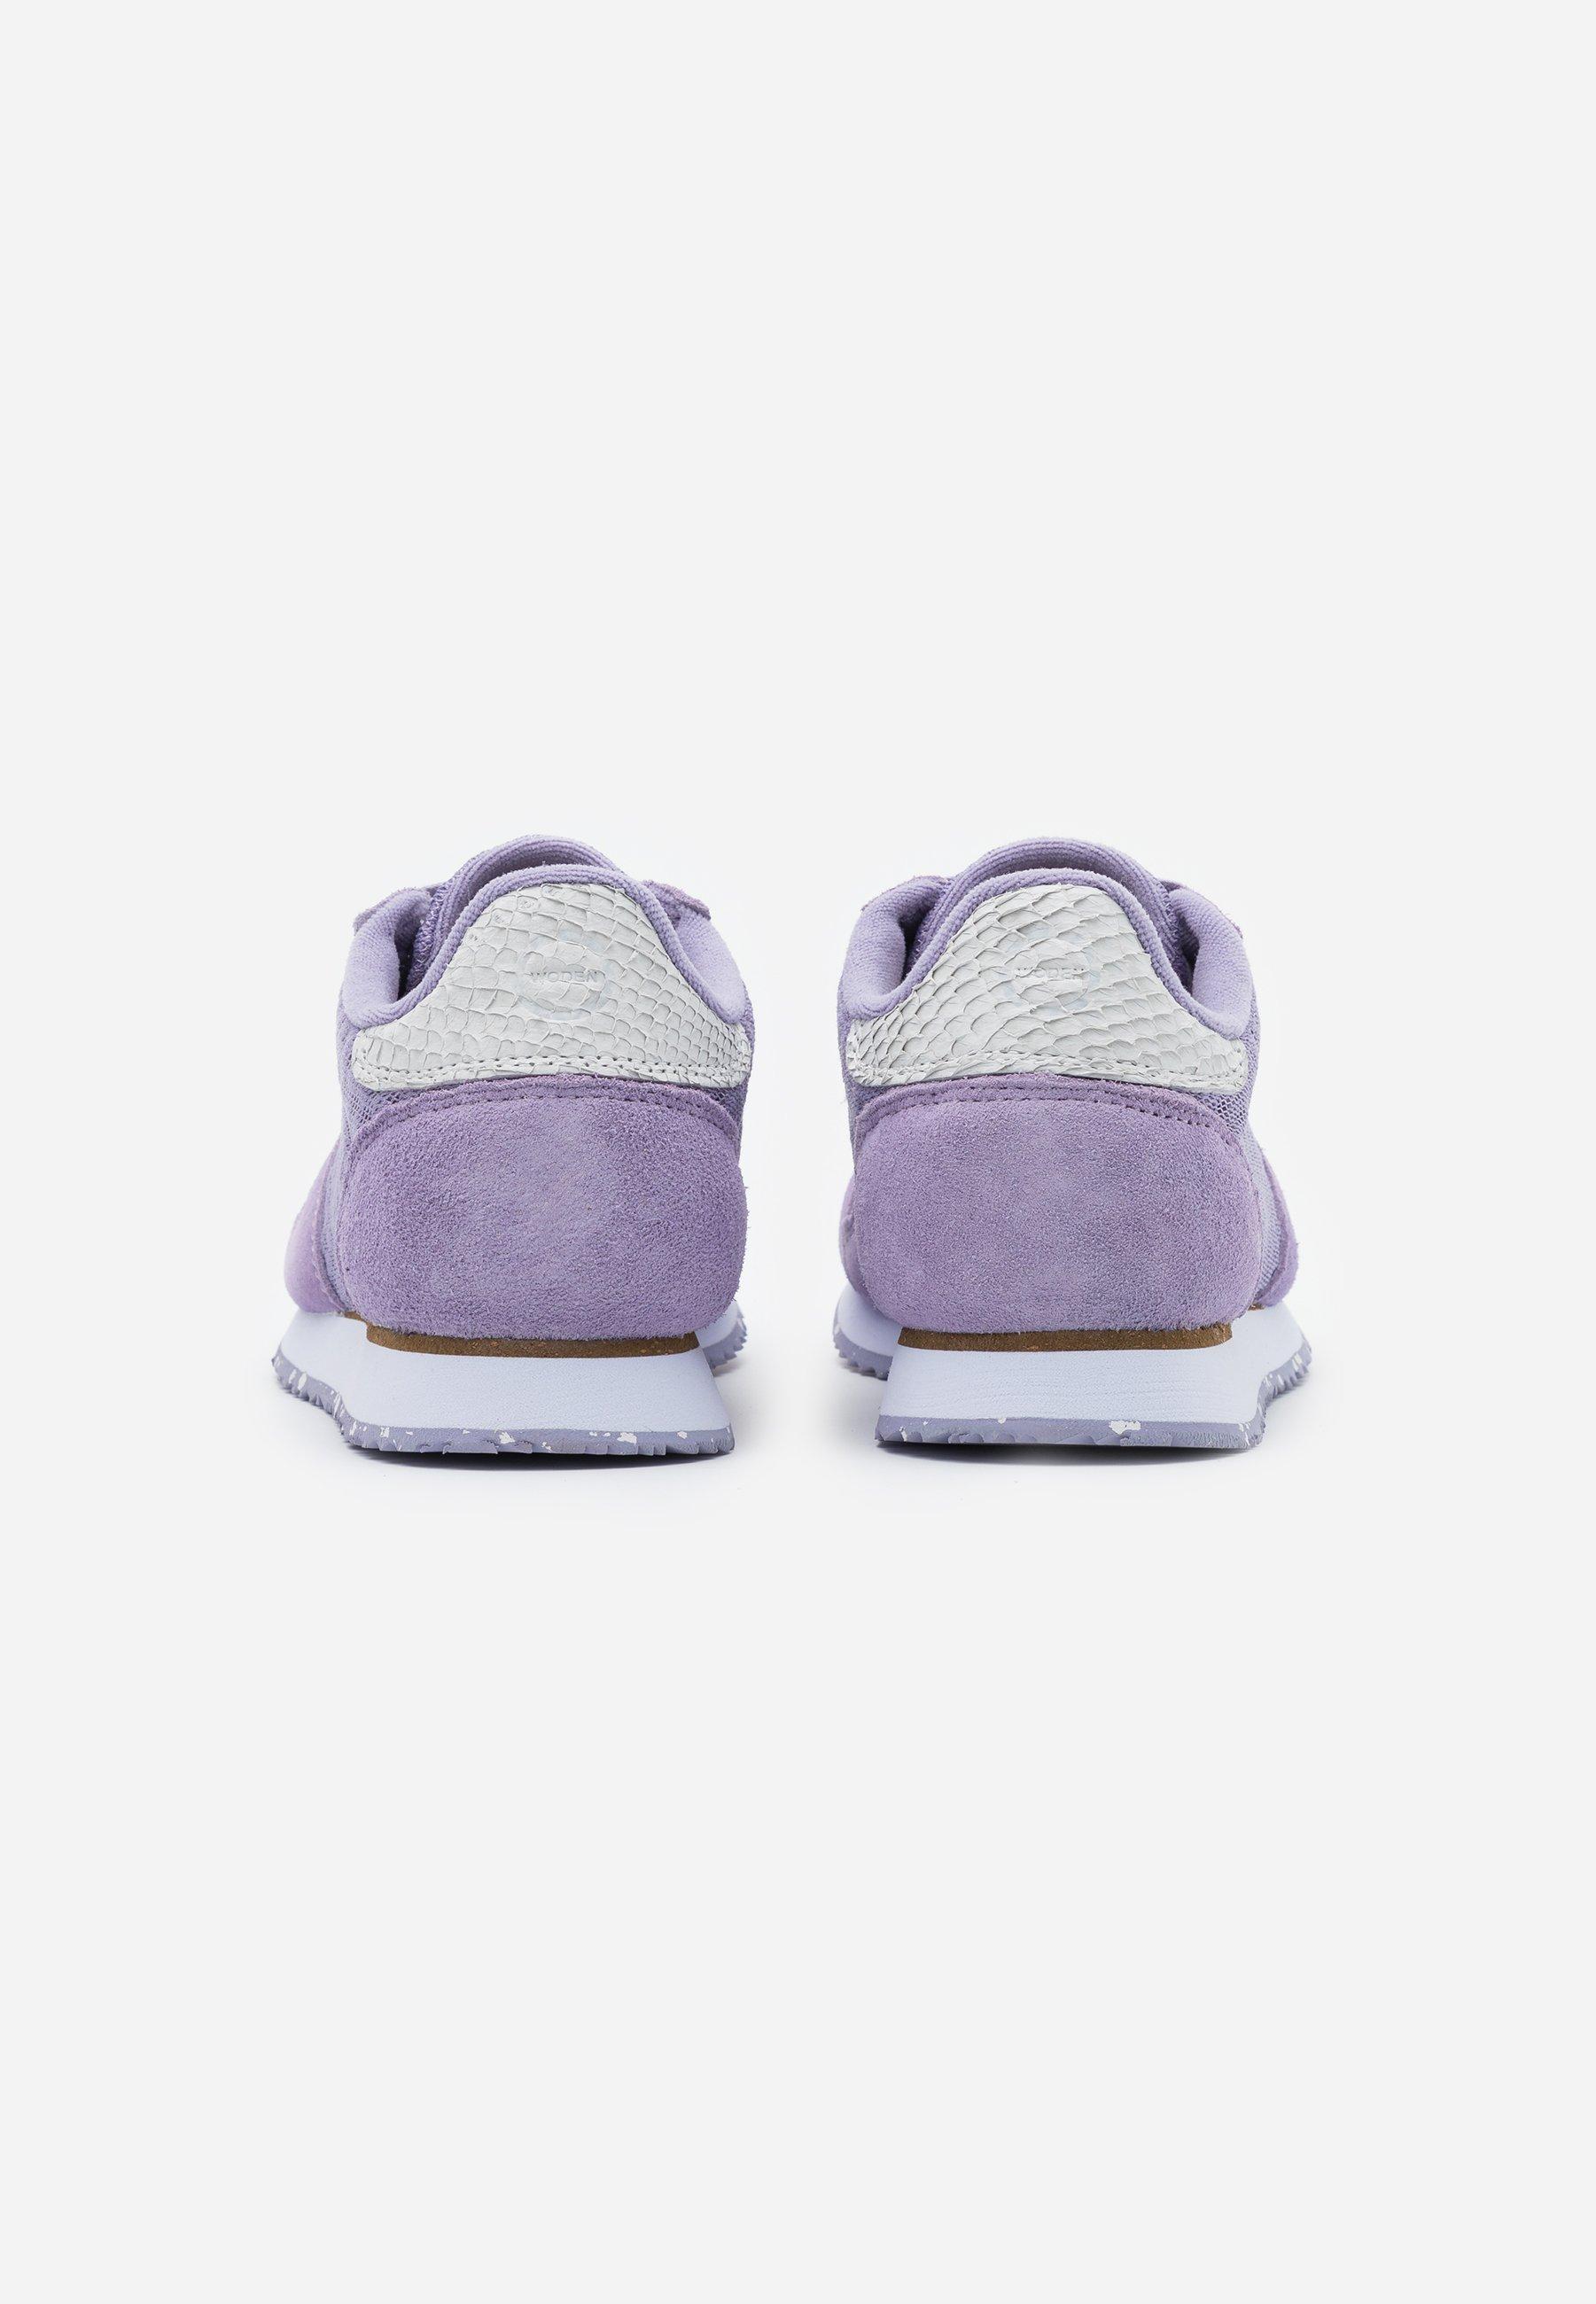 Woden YDUN SUEDE MESH II - Trainers - lavender Women's Skate Shoes KGo9w